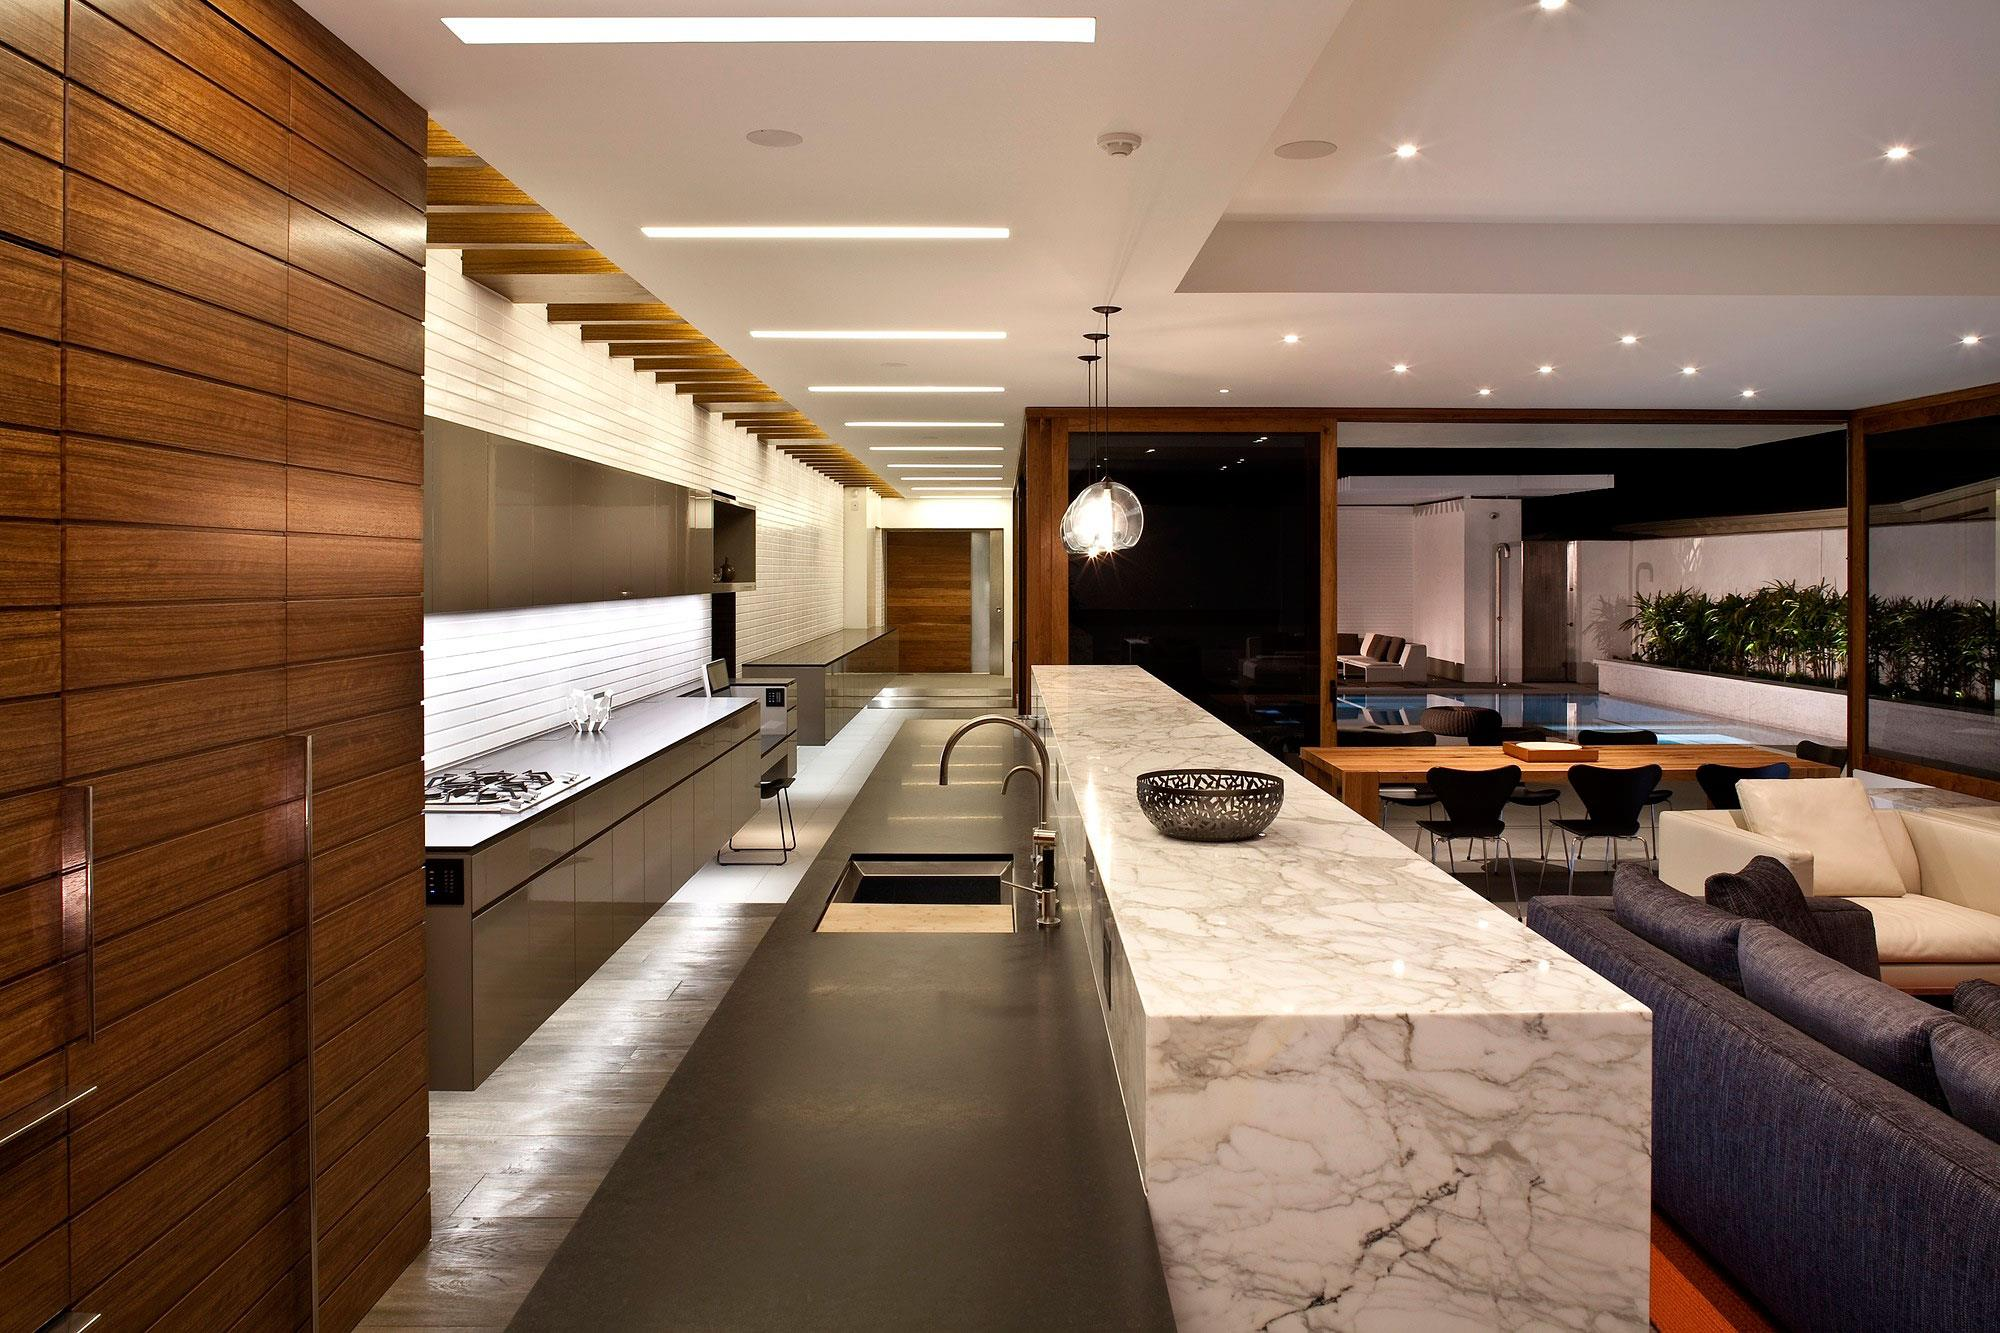 Lujosa arquitectura moderna con elegante dise o de for Arquitectura de interiores